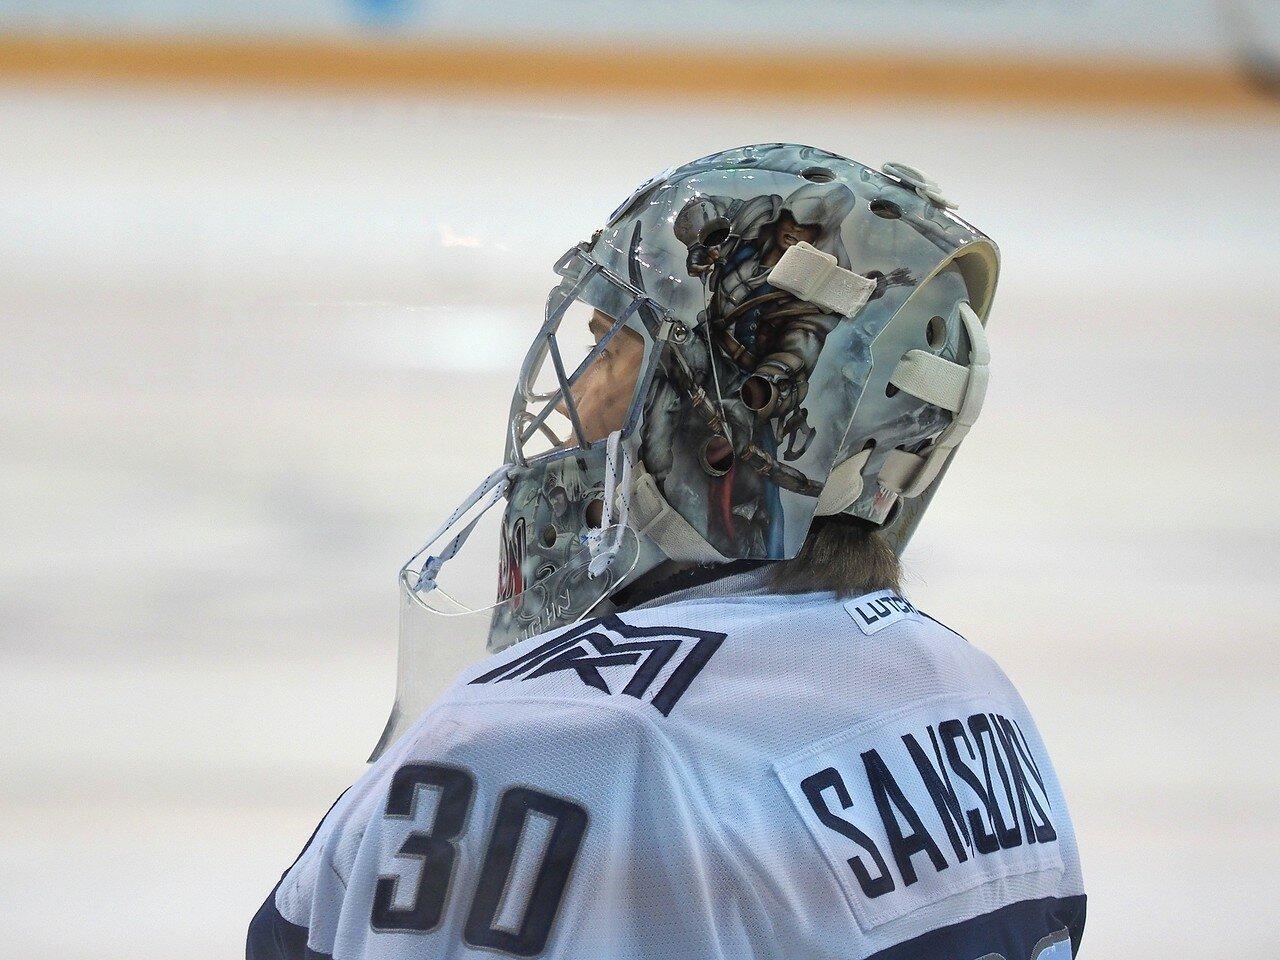 32Плей-офф 2016 Восток 1/2 Металлург - Сибирь 10.03.2016